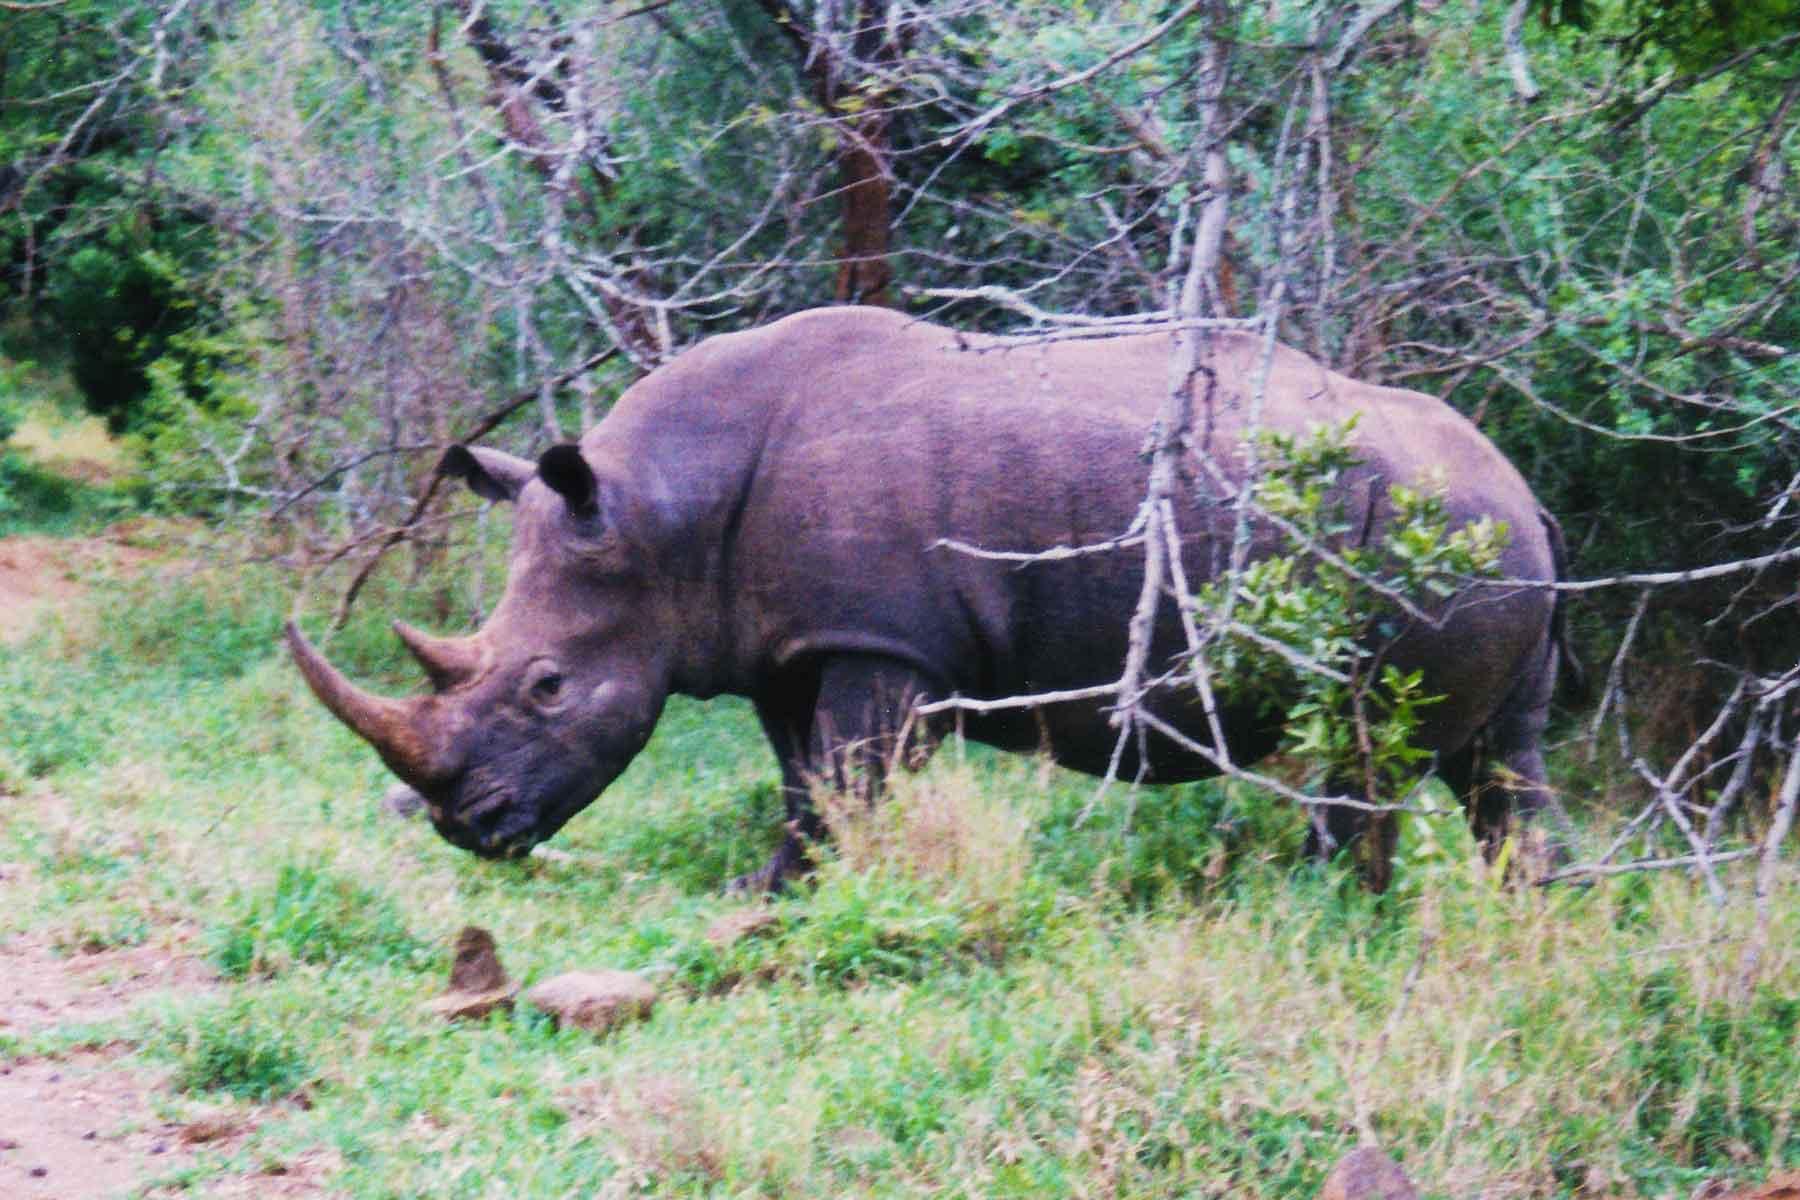 Rhino - Hluhluwe-Umfolozi Game Reserve - Steven Andrew Martin - South Africa Photo Journal - International Education Online